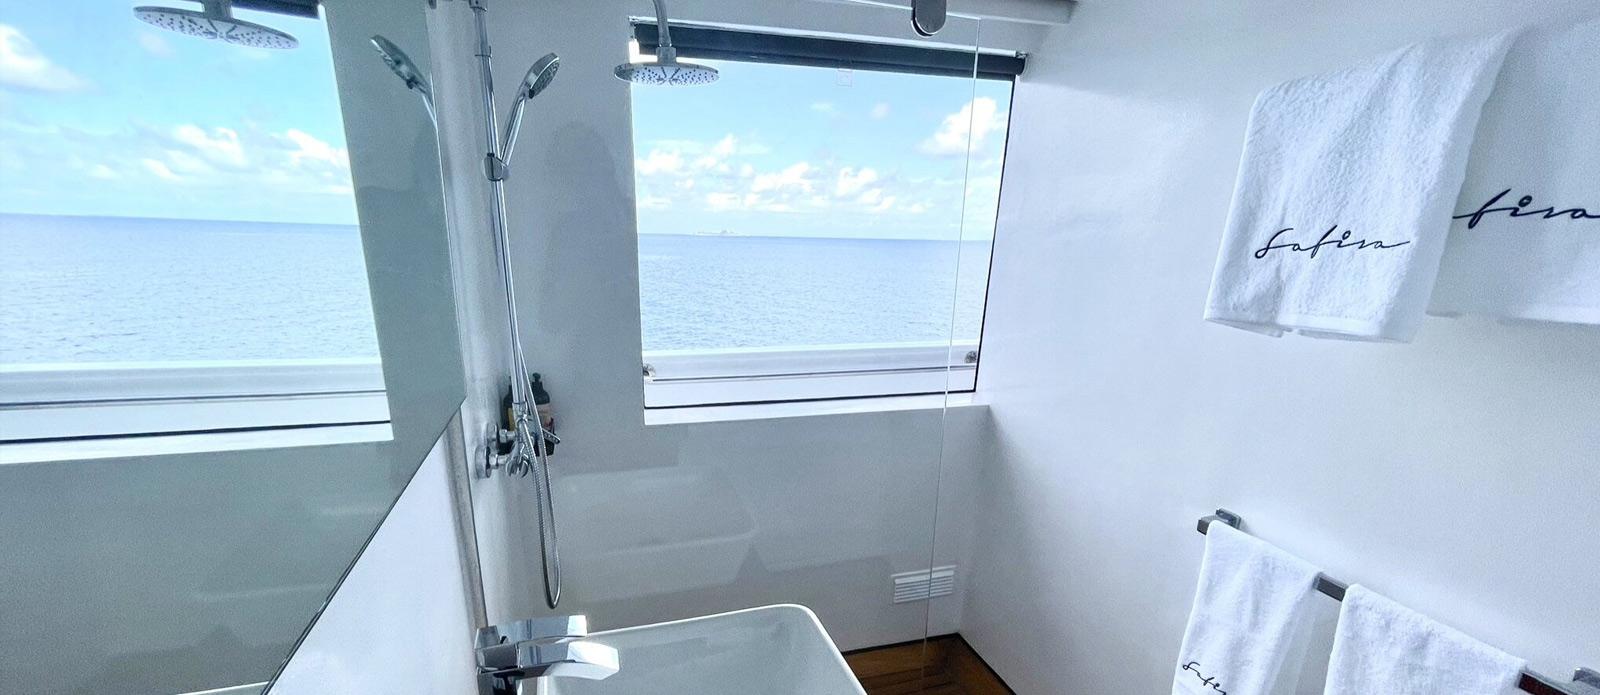 Safira-Luxury-Yacht-For-Sale-Interior-11